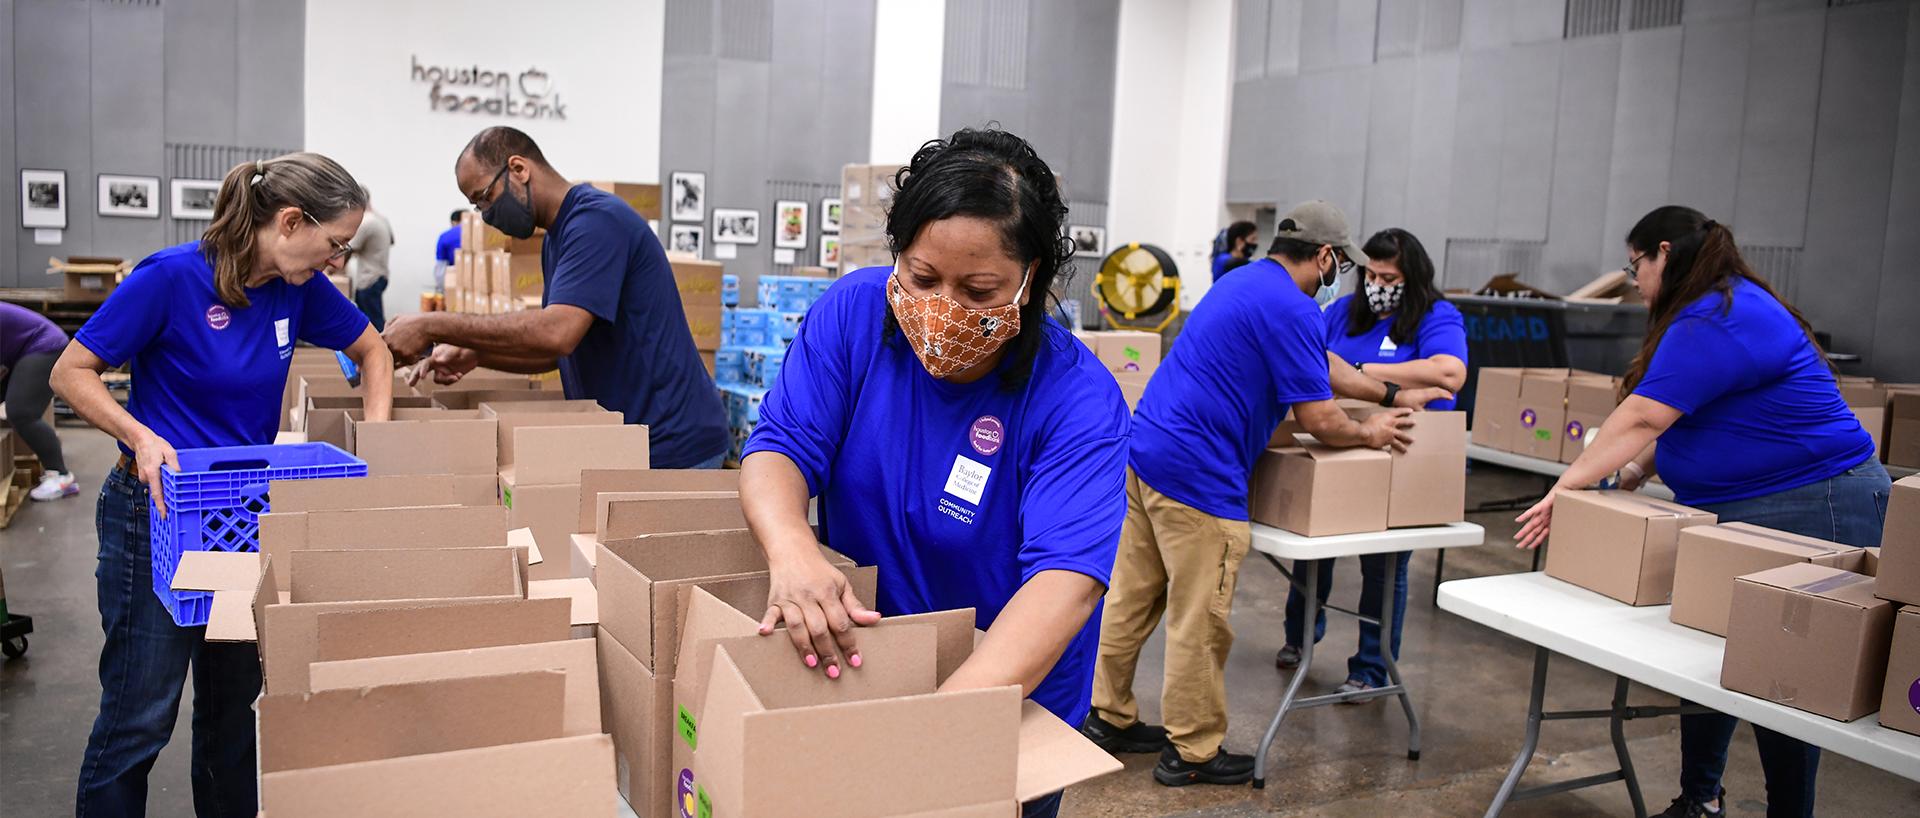 Baylor volunteers at Houston Food Bank